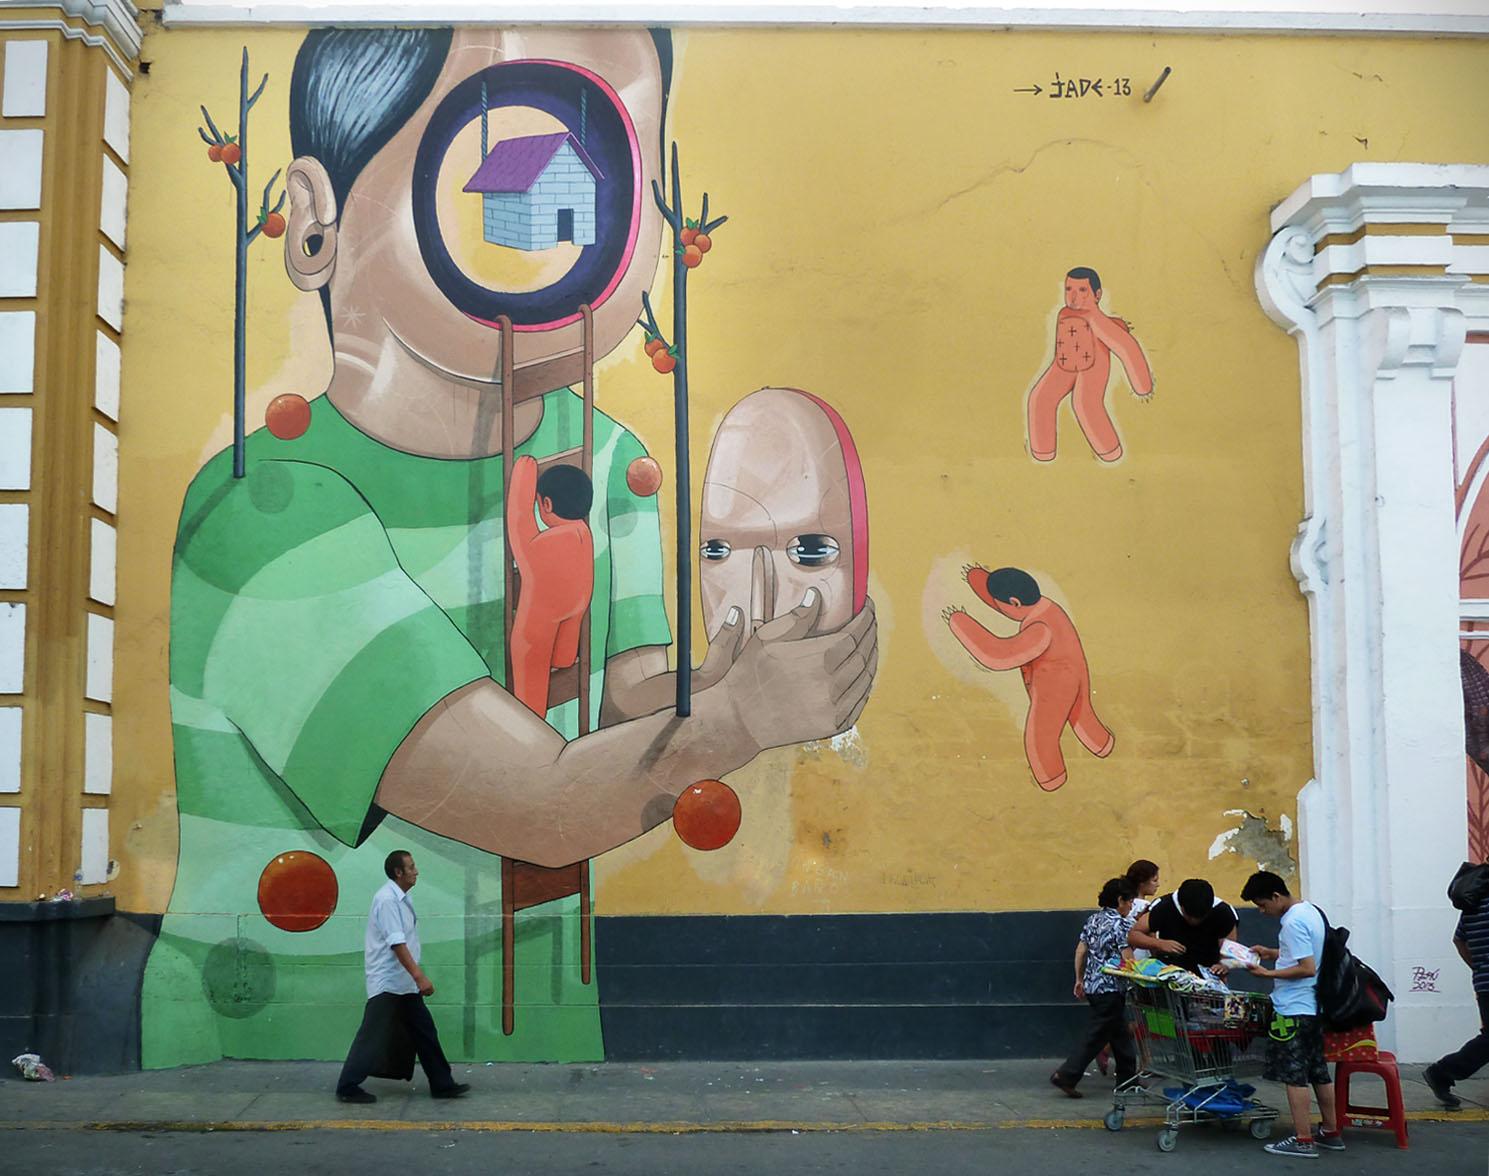 Jade New Mural In Lima, Peru   StreetArtNews   StreetArtNews